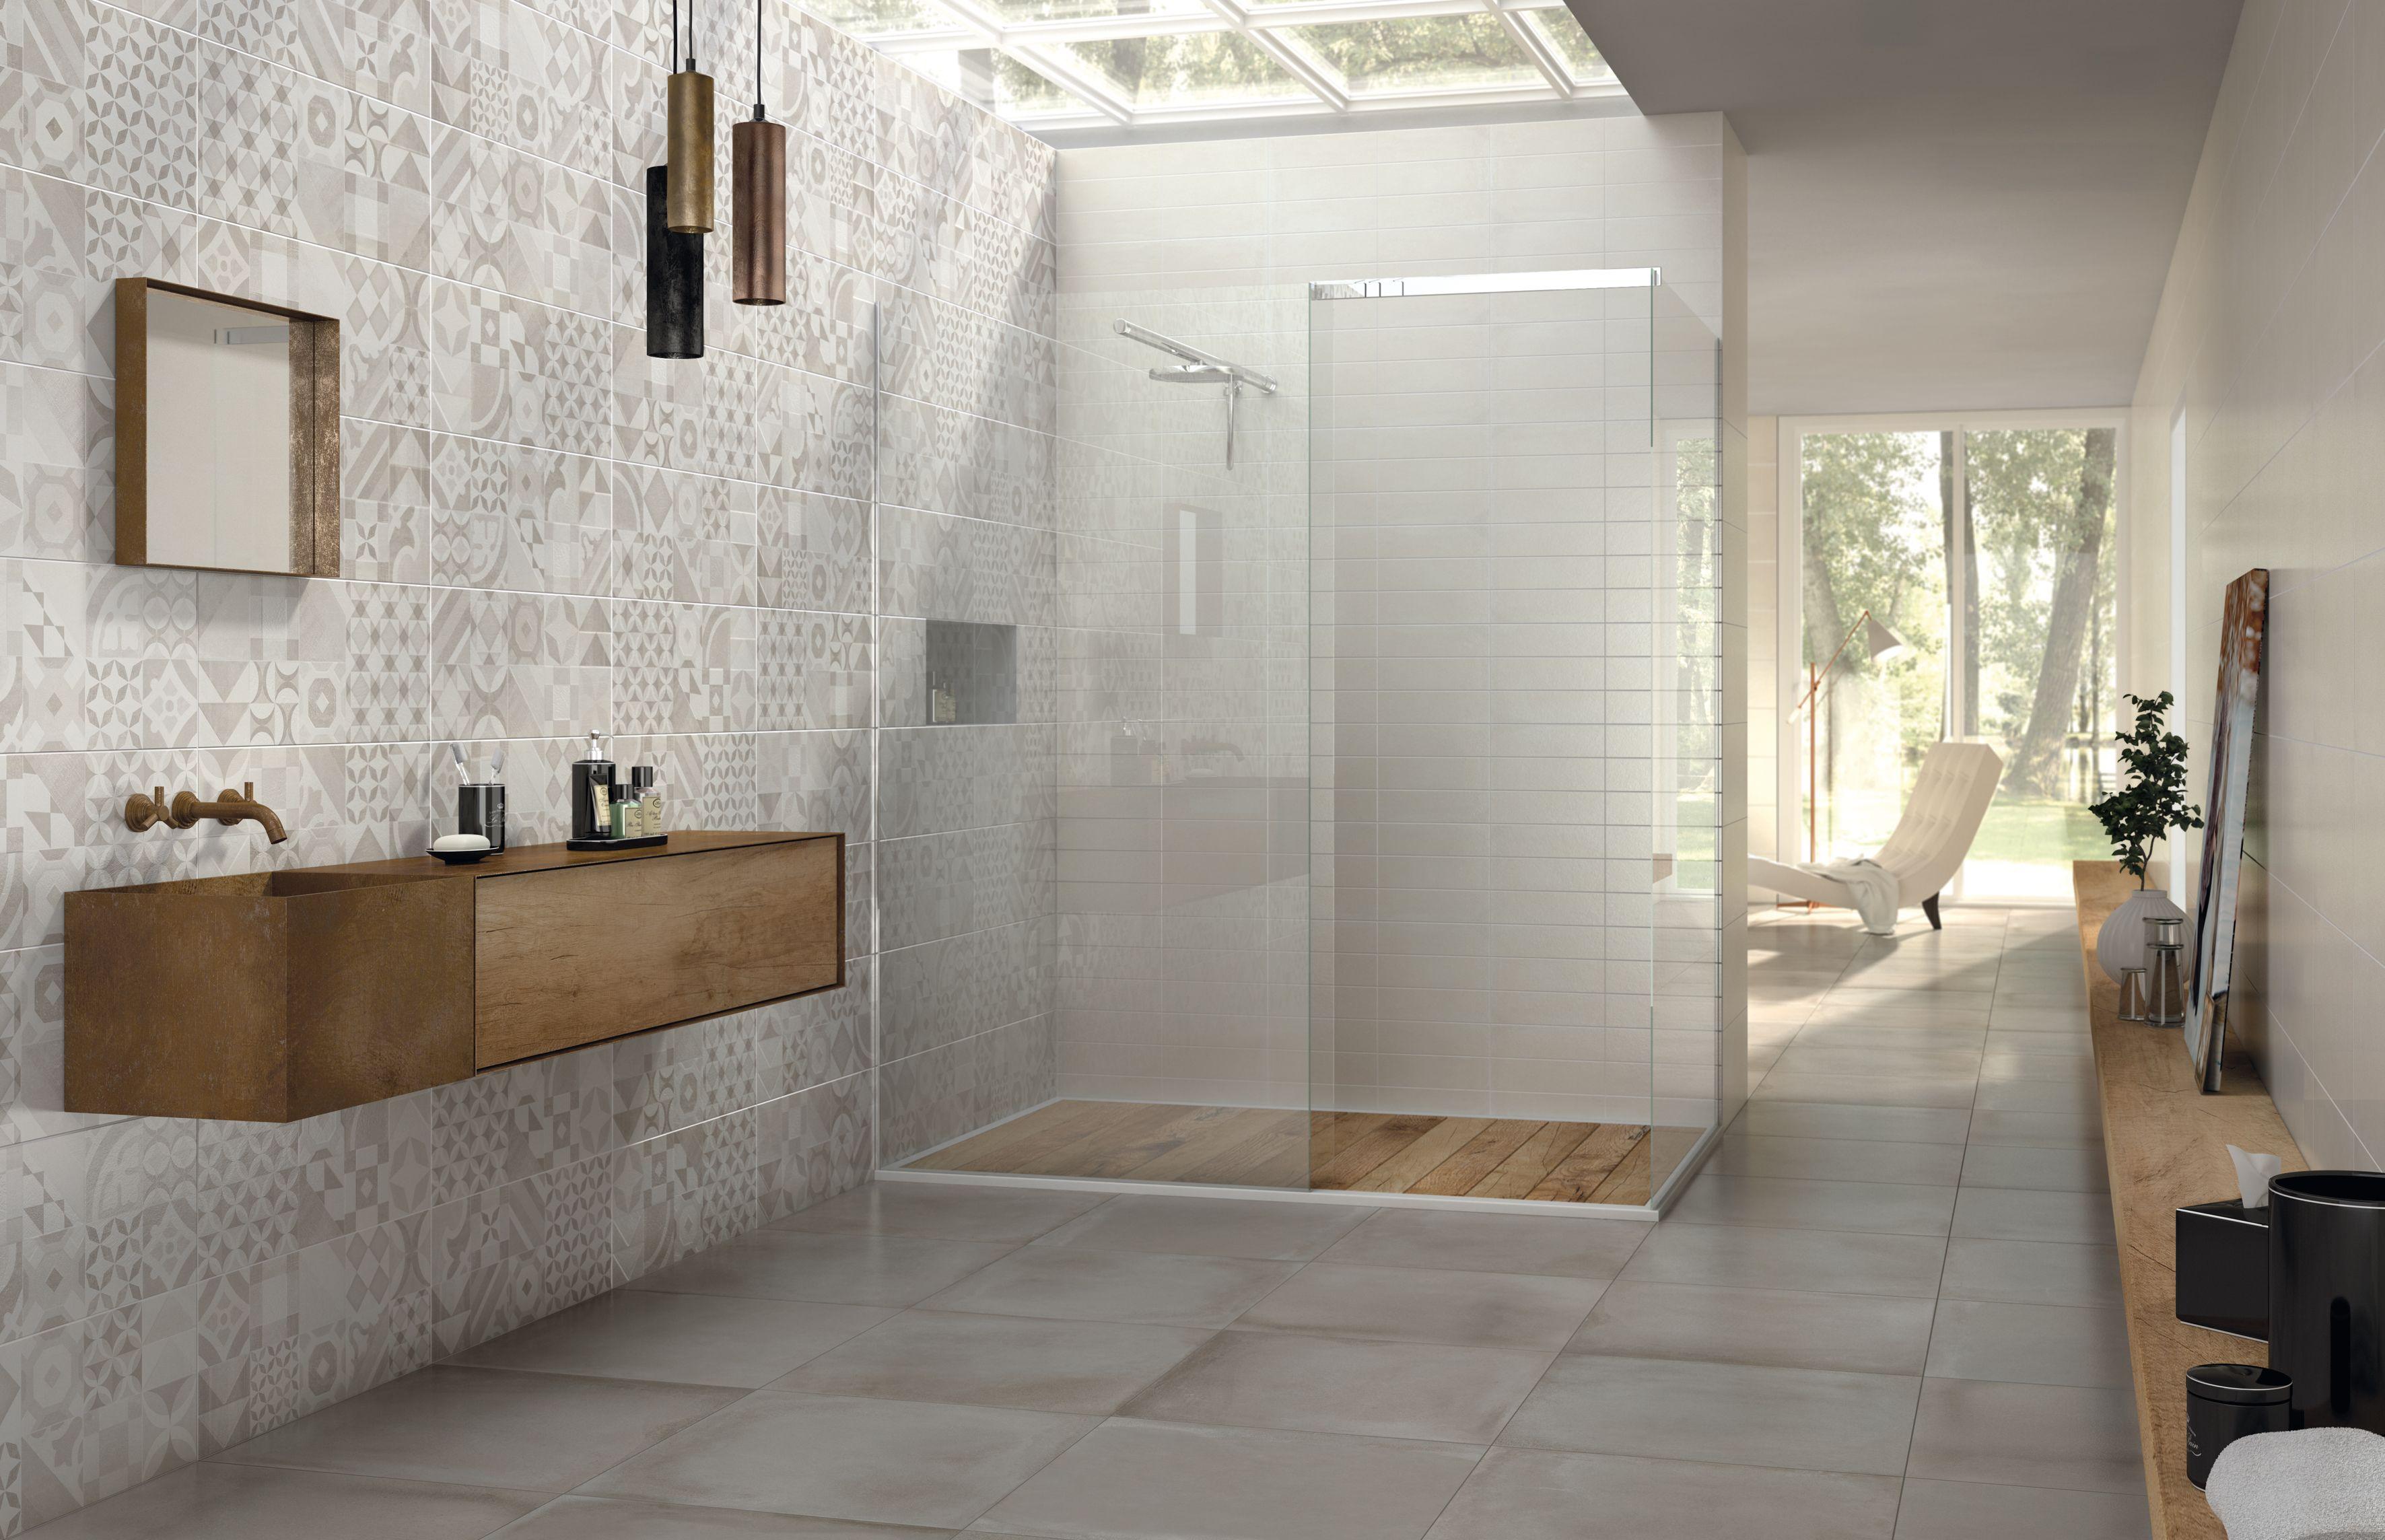 Carrelage décoration mur salle de bain 26x60,5 Sugar Wall ...